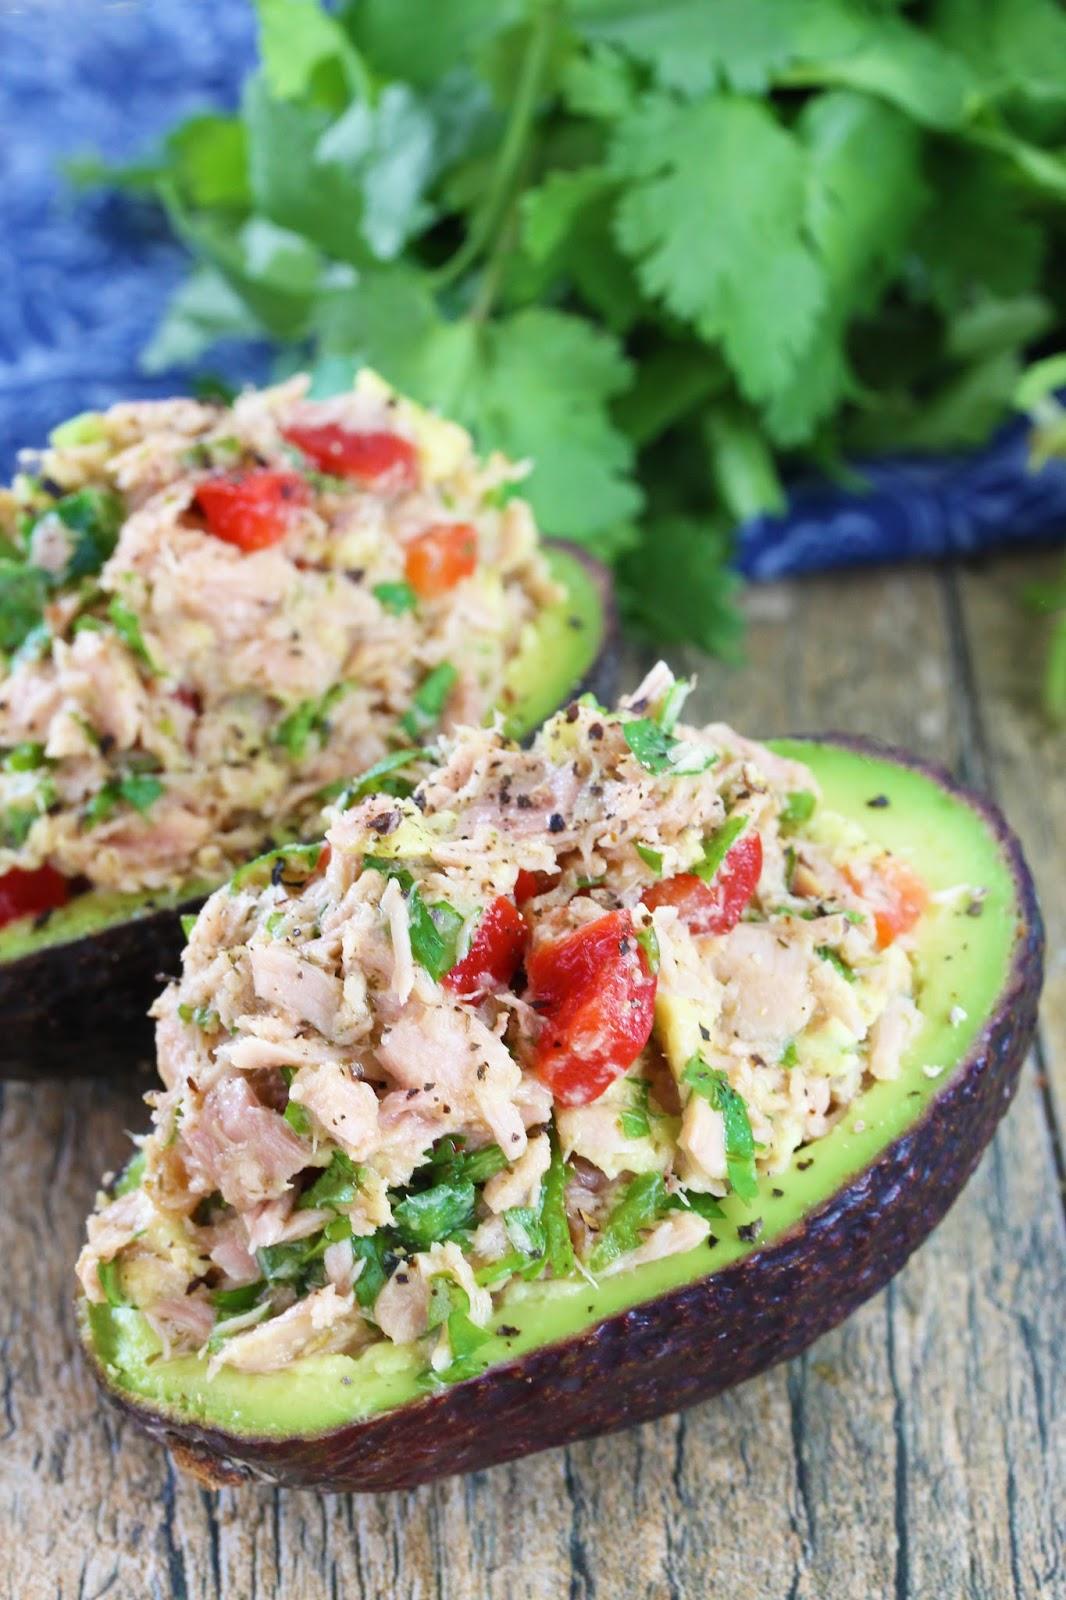 ... avocado avocado stuffed with tuna tuna stuffed avocados stuffed